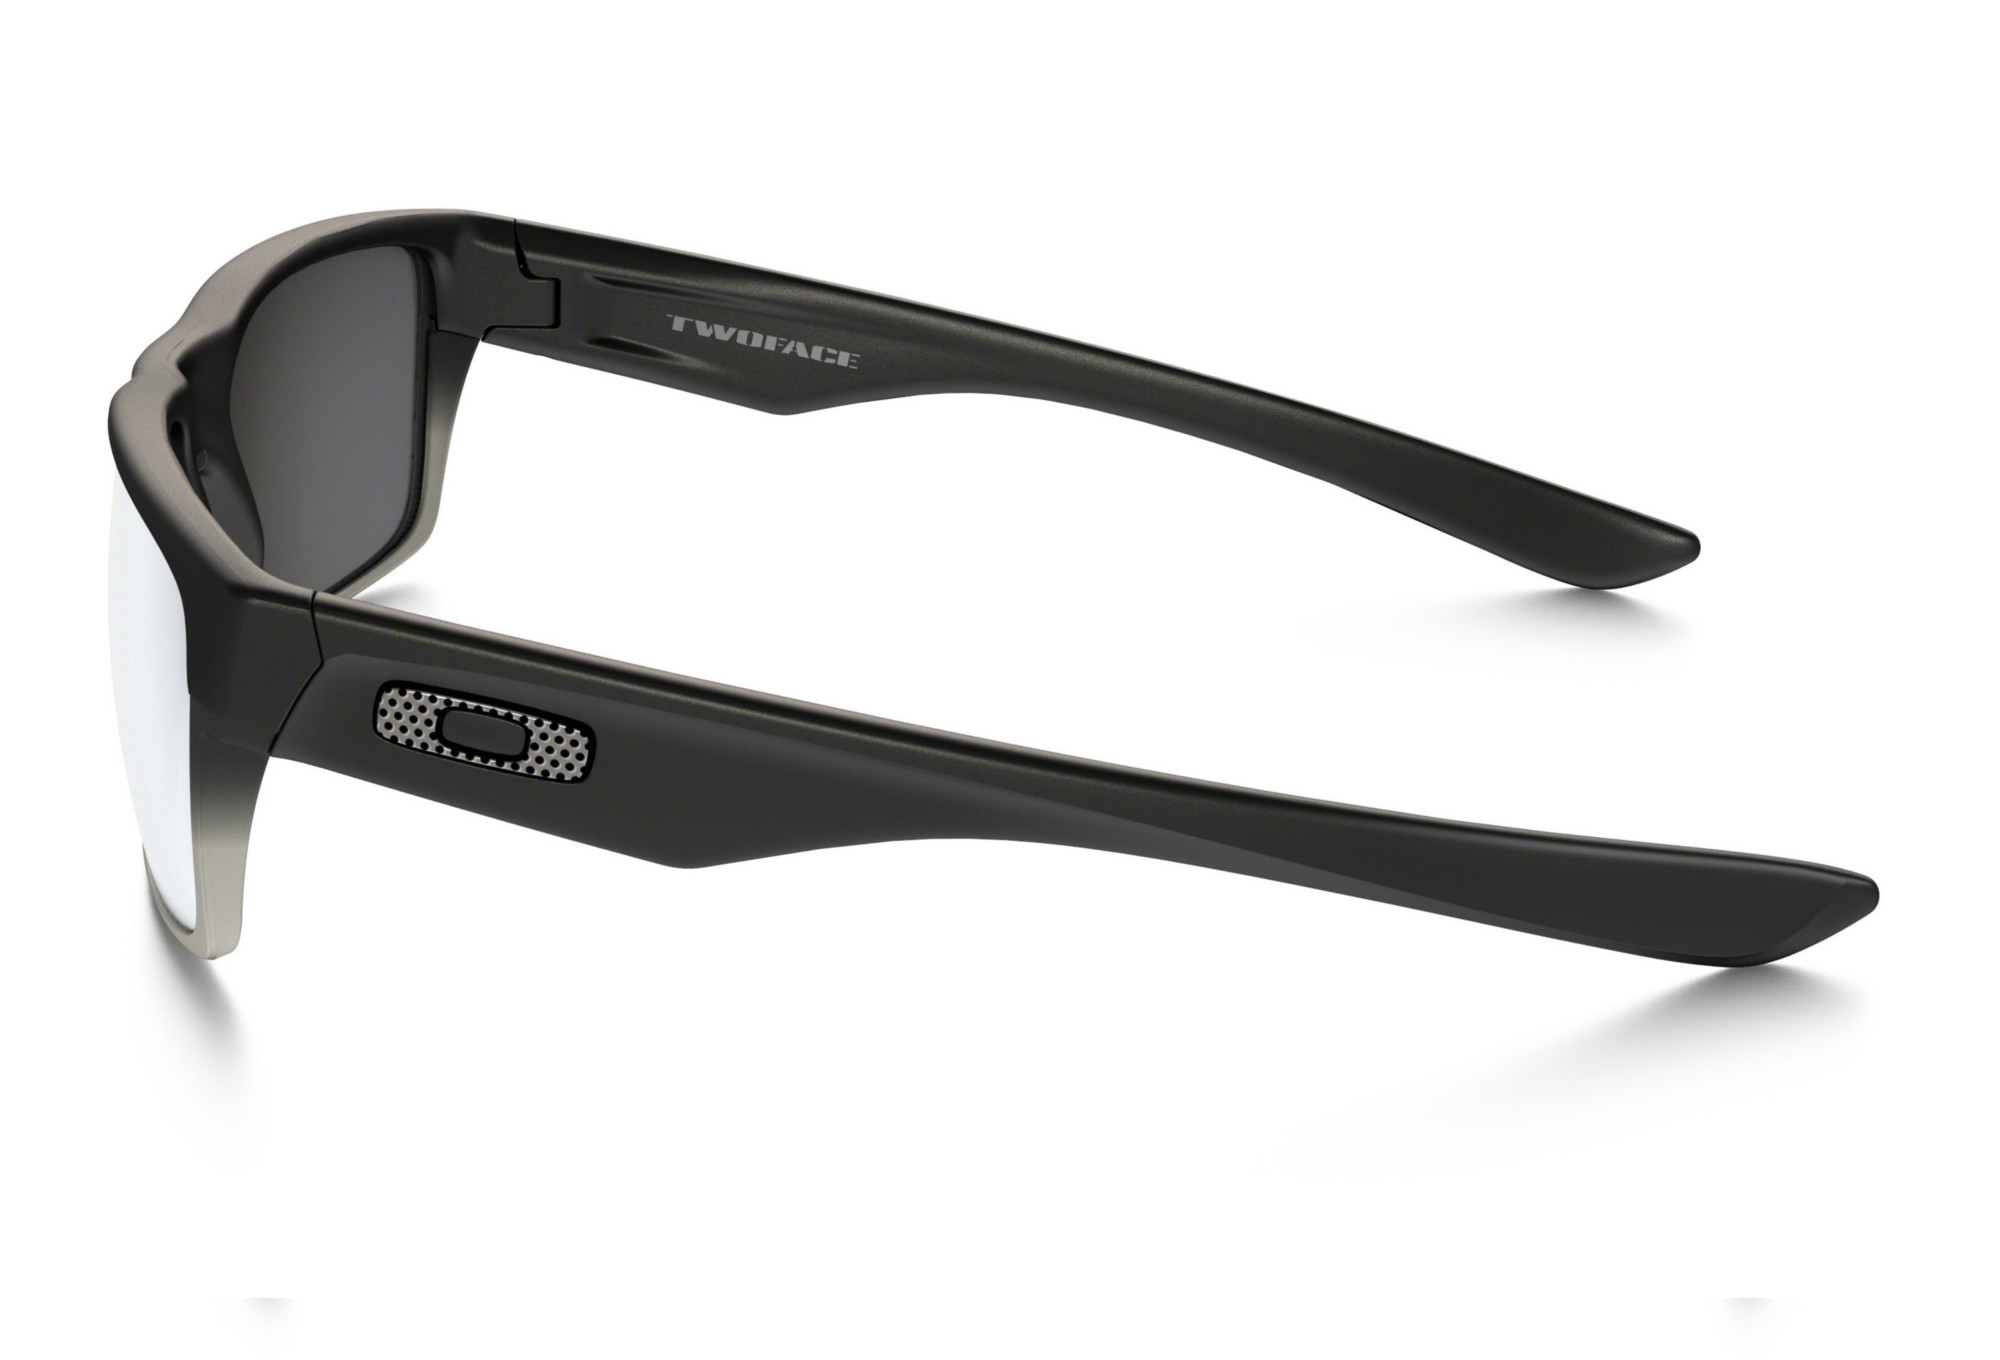 Ref 30 Iridium Oo9189 Twoface Noir Oakley Lunettes Machinist Chrome 0vmN8nwyO